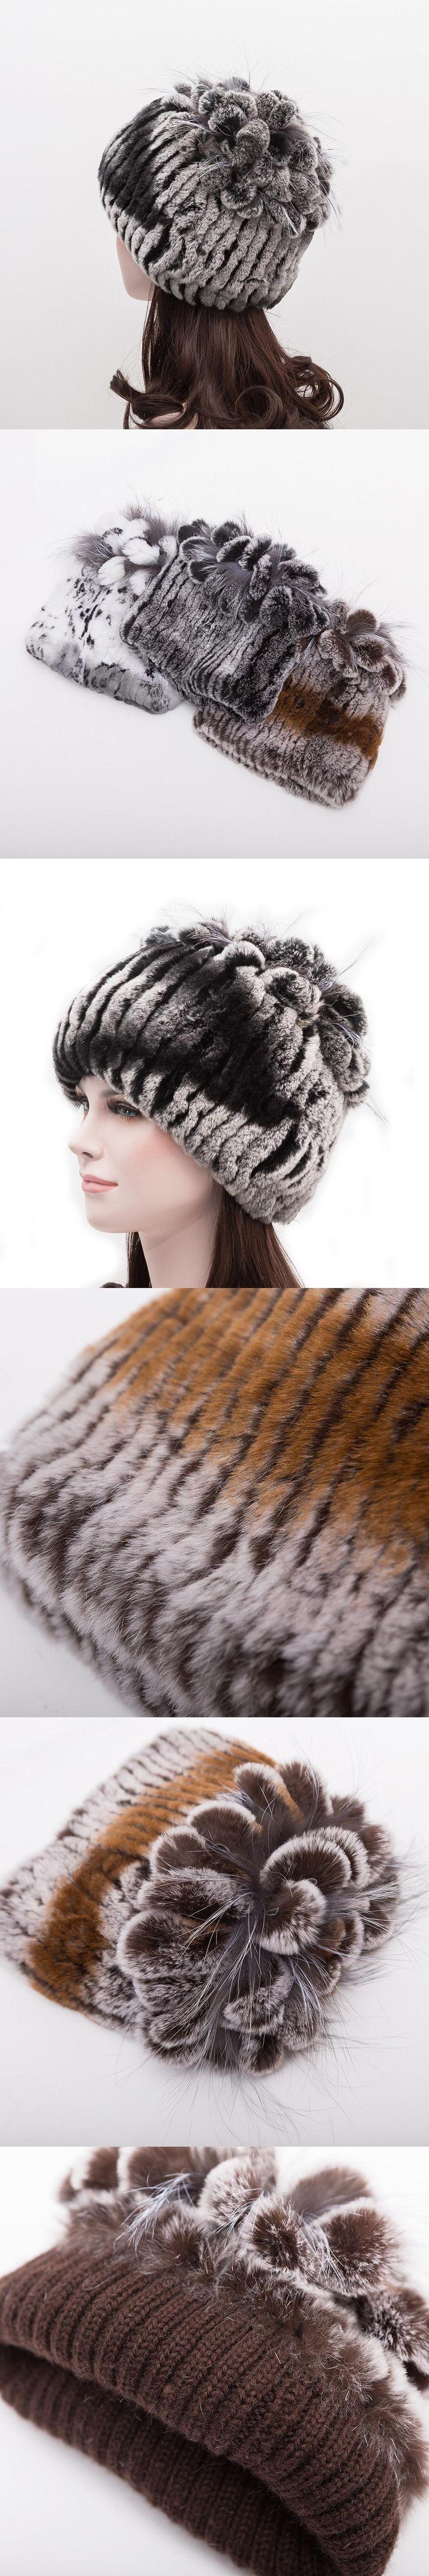 Knitted Hat 2017 Winter Rabbit Fur Beanies Headgear Women Silver Fox Fur Luxury Ball Flower Cap Women's Customized Hat Beanie